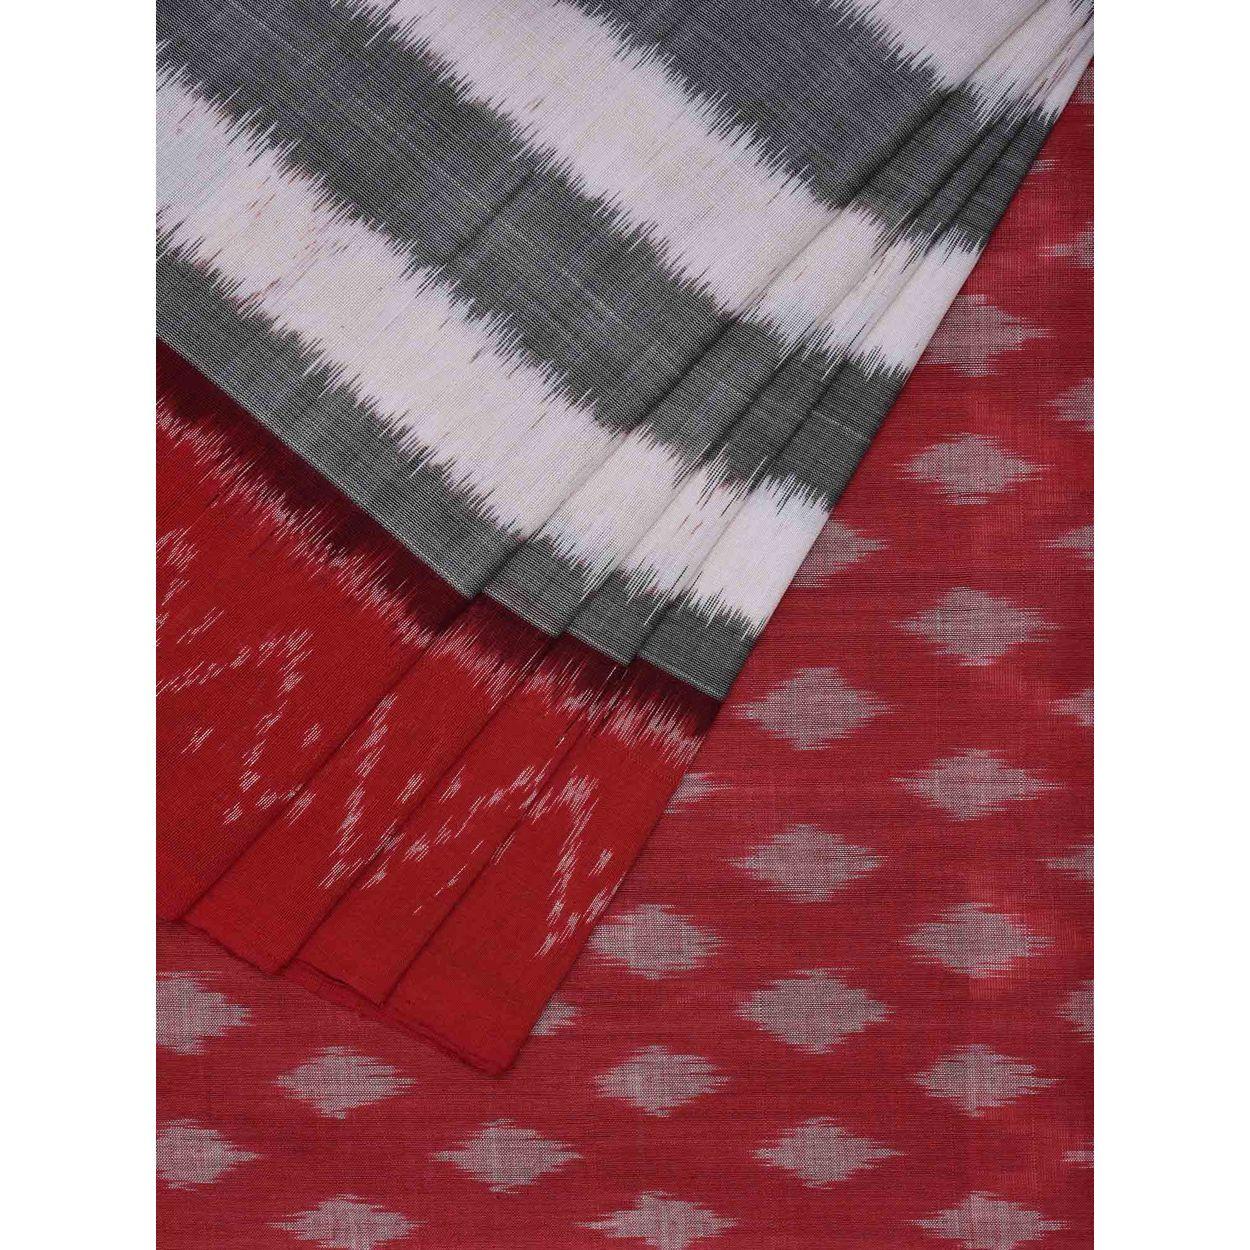 15eac5b69767c1 Grey Color Sari   Pochampally Ikat Cotton Handloom Saree i0461